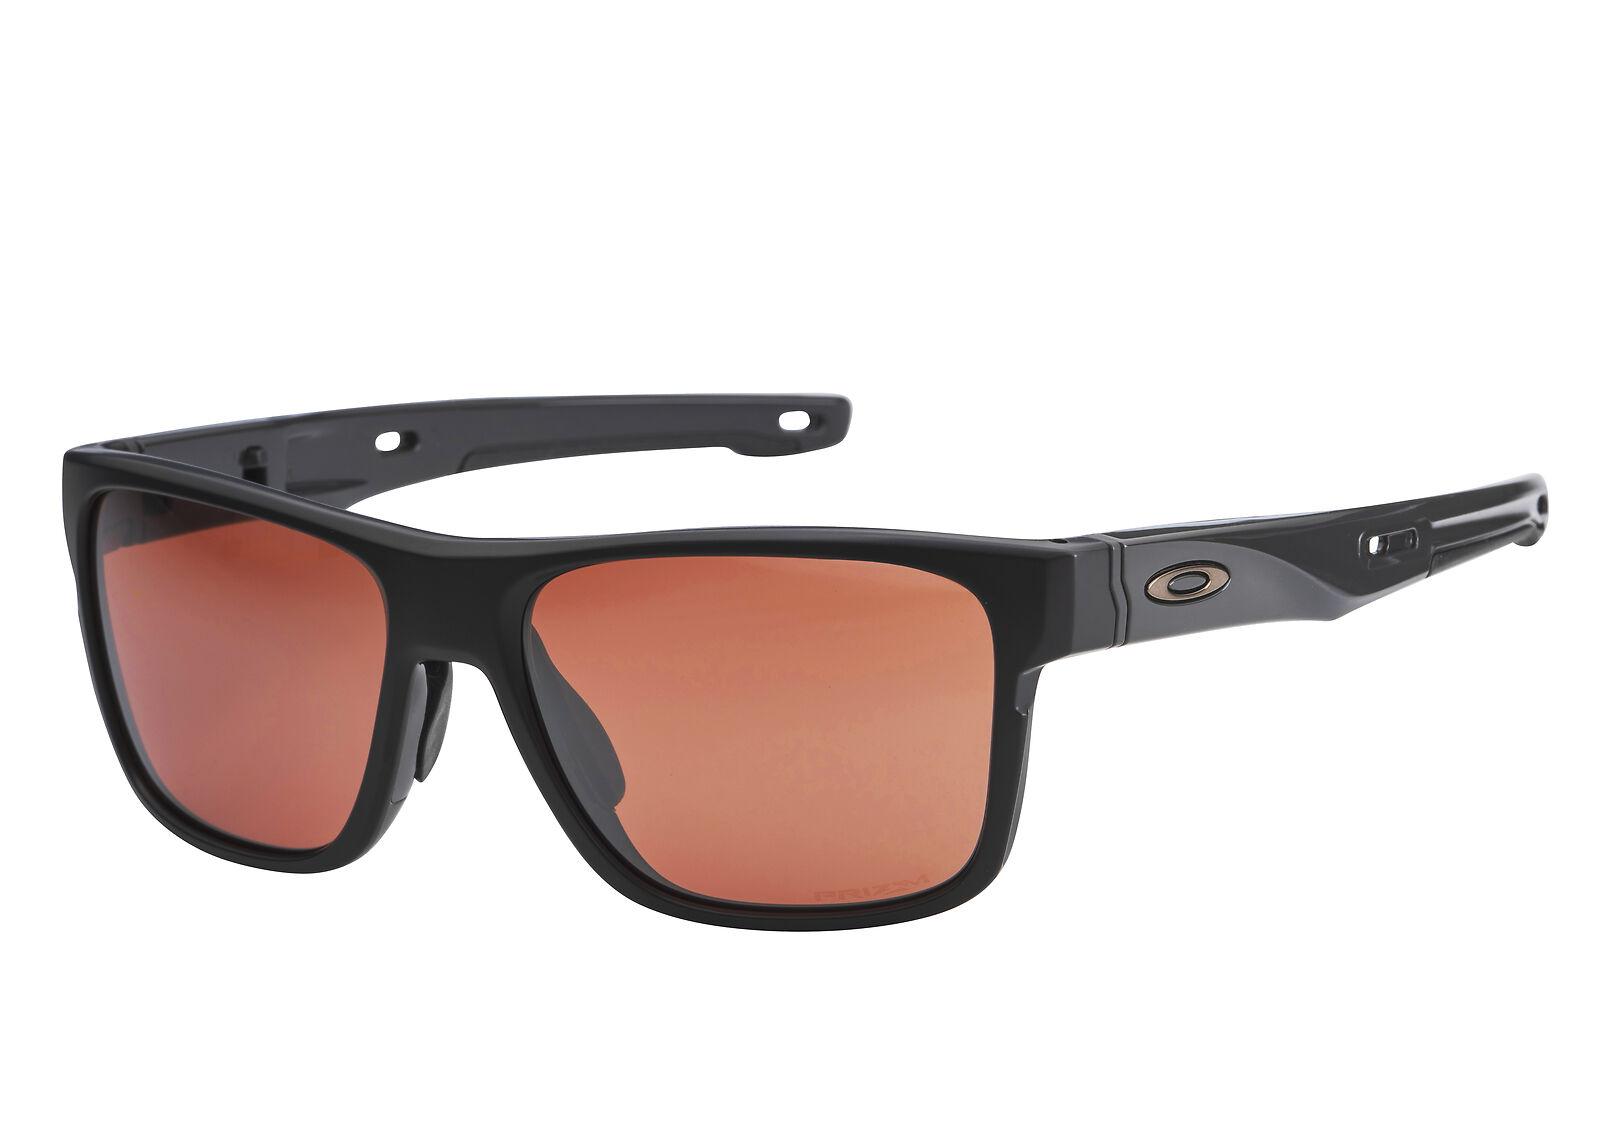 f079acb9827 Oakley Crossrange Sunglasses Matte Black Prizm Dark Golf OO9361-17 9361-17  57mm